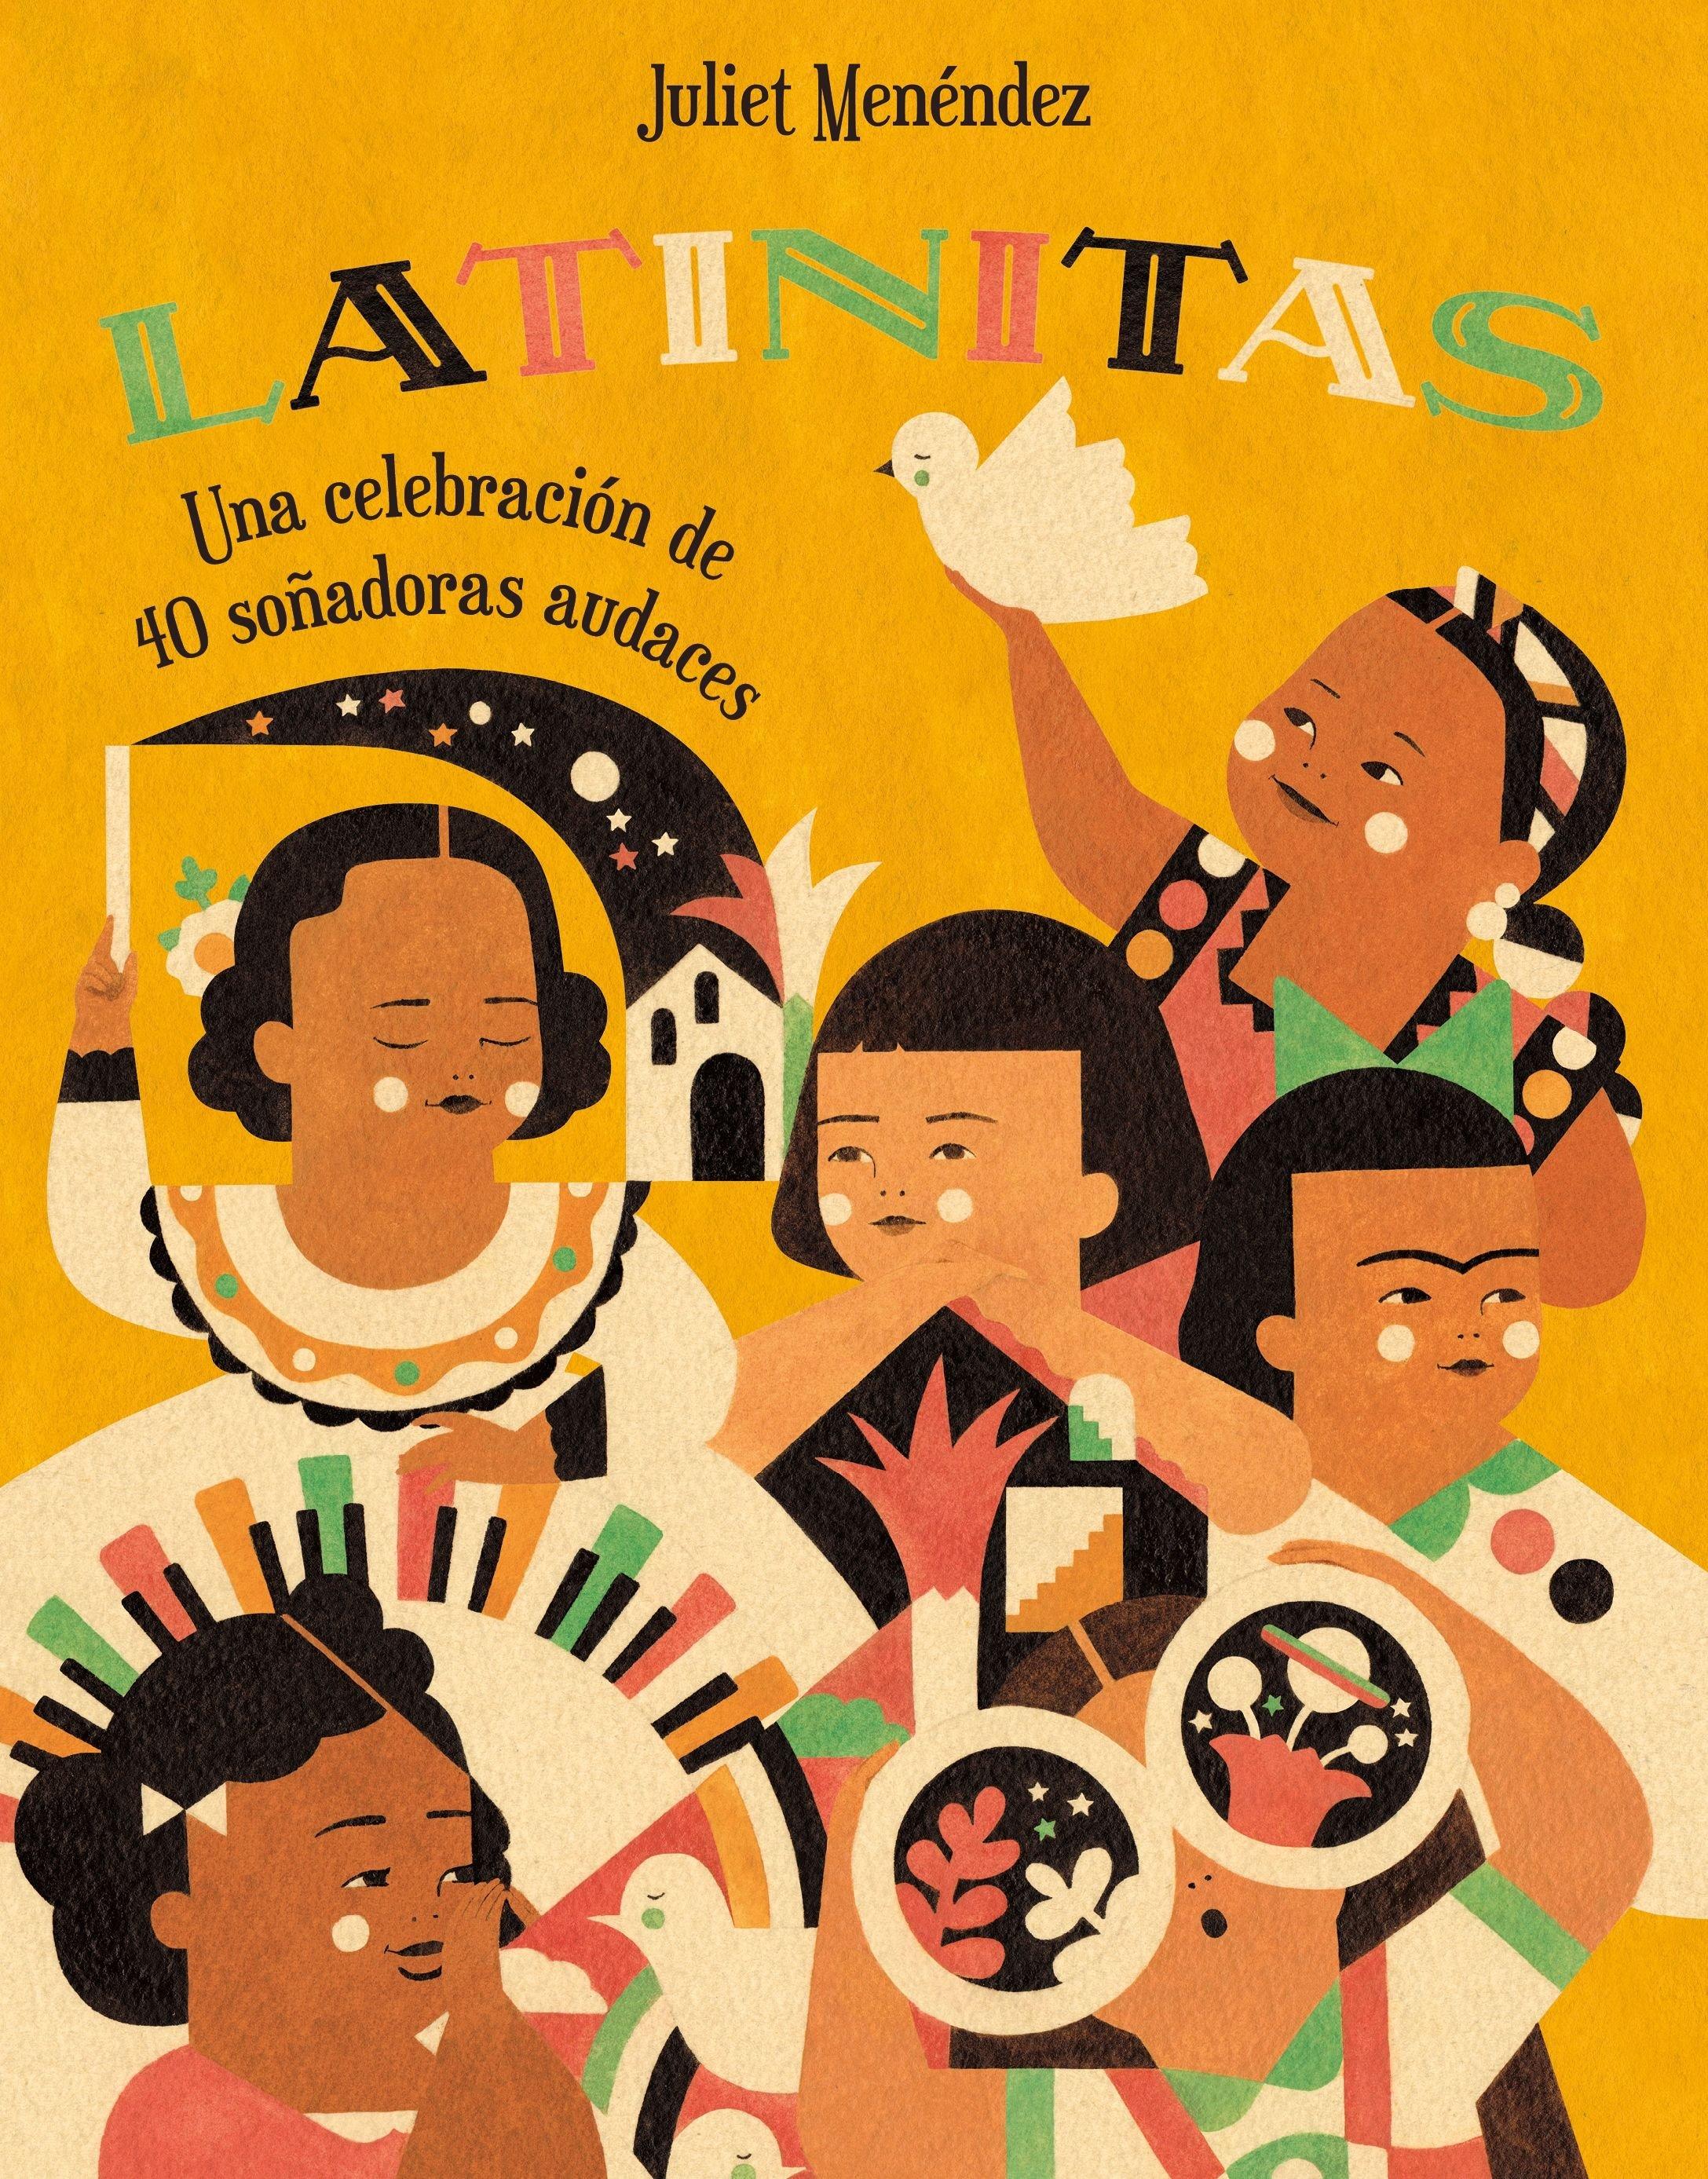 Edición en español de Latinitas